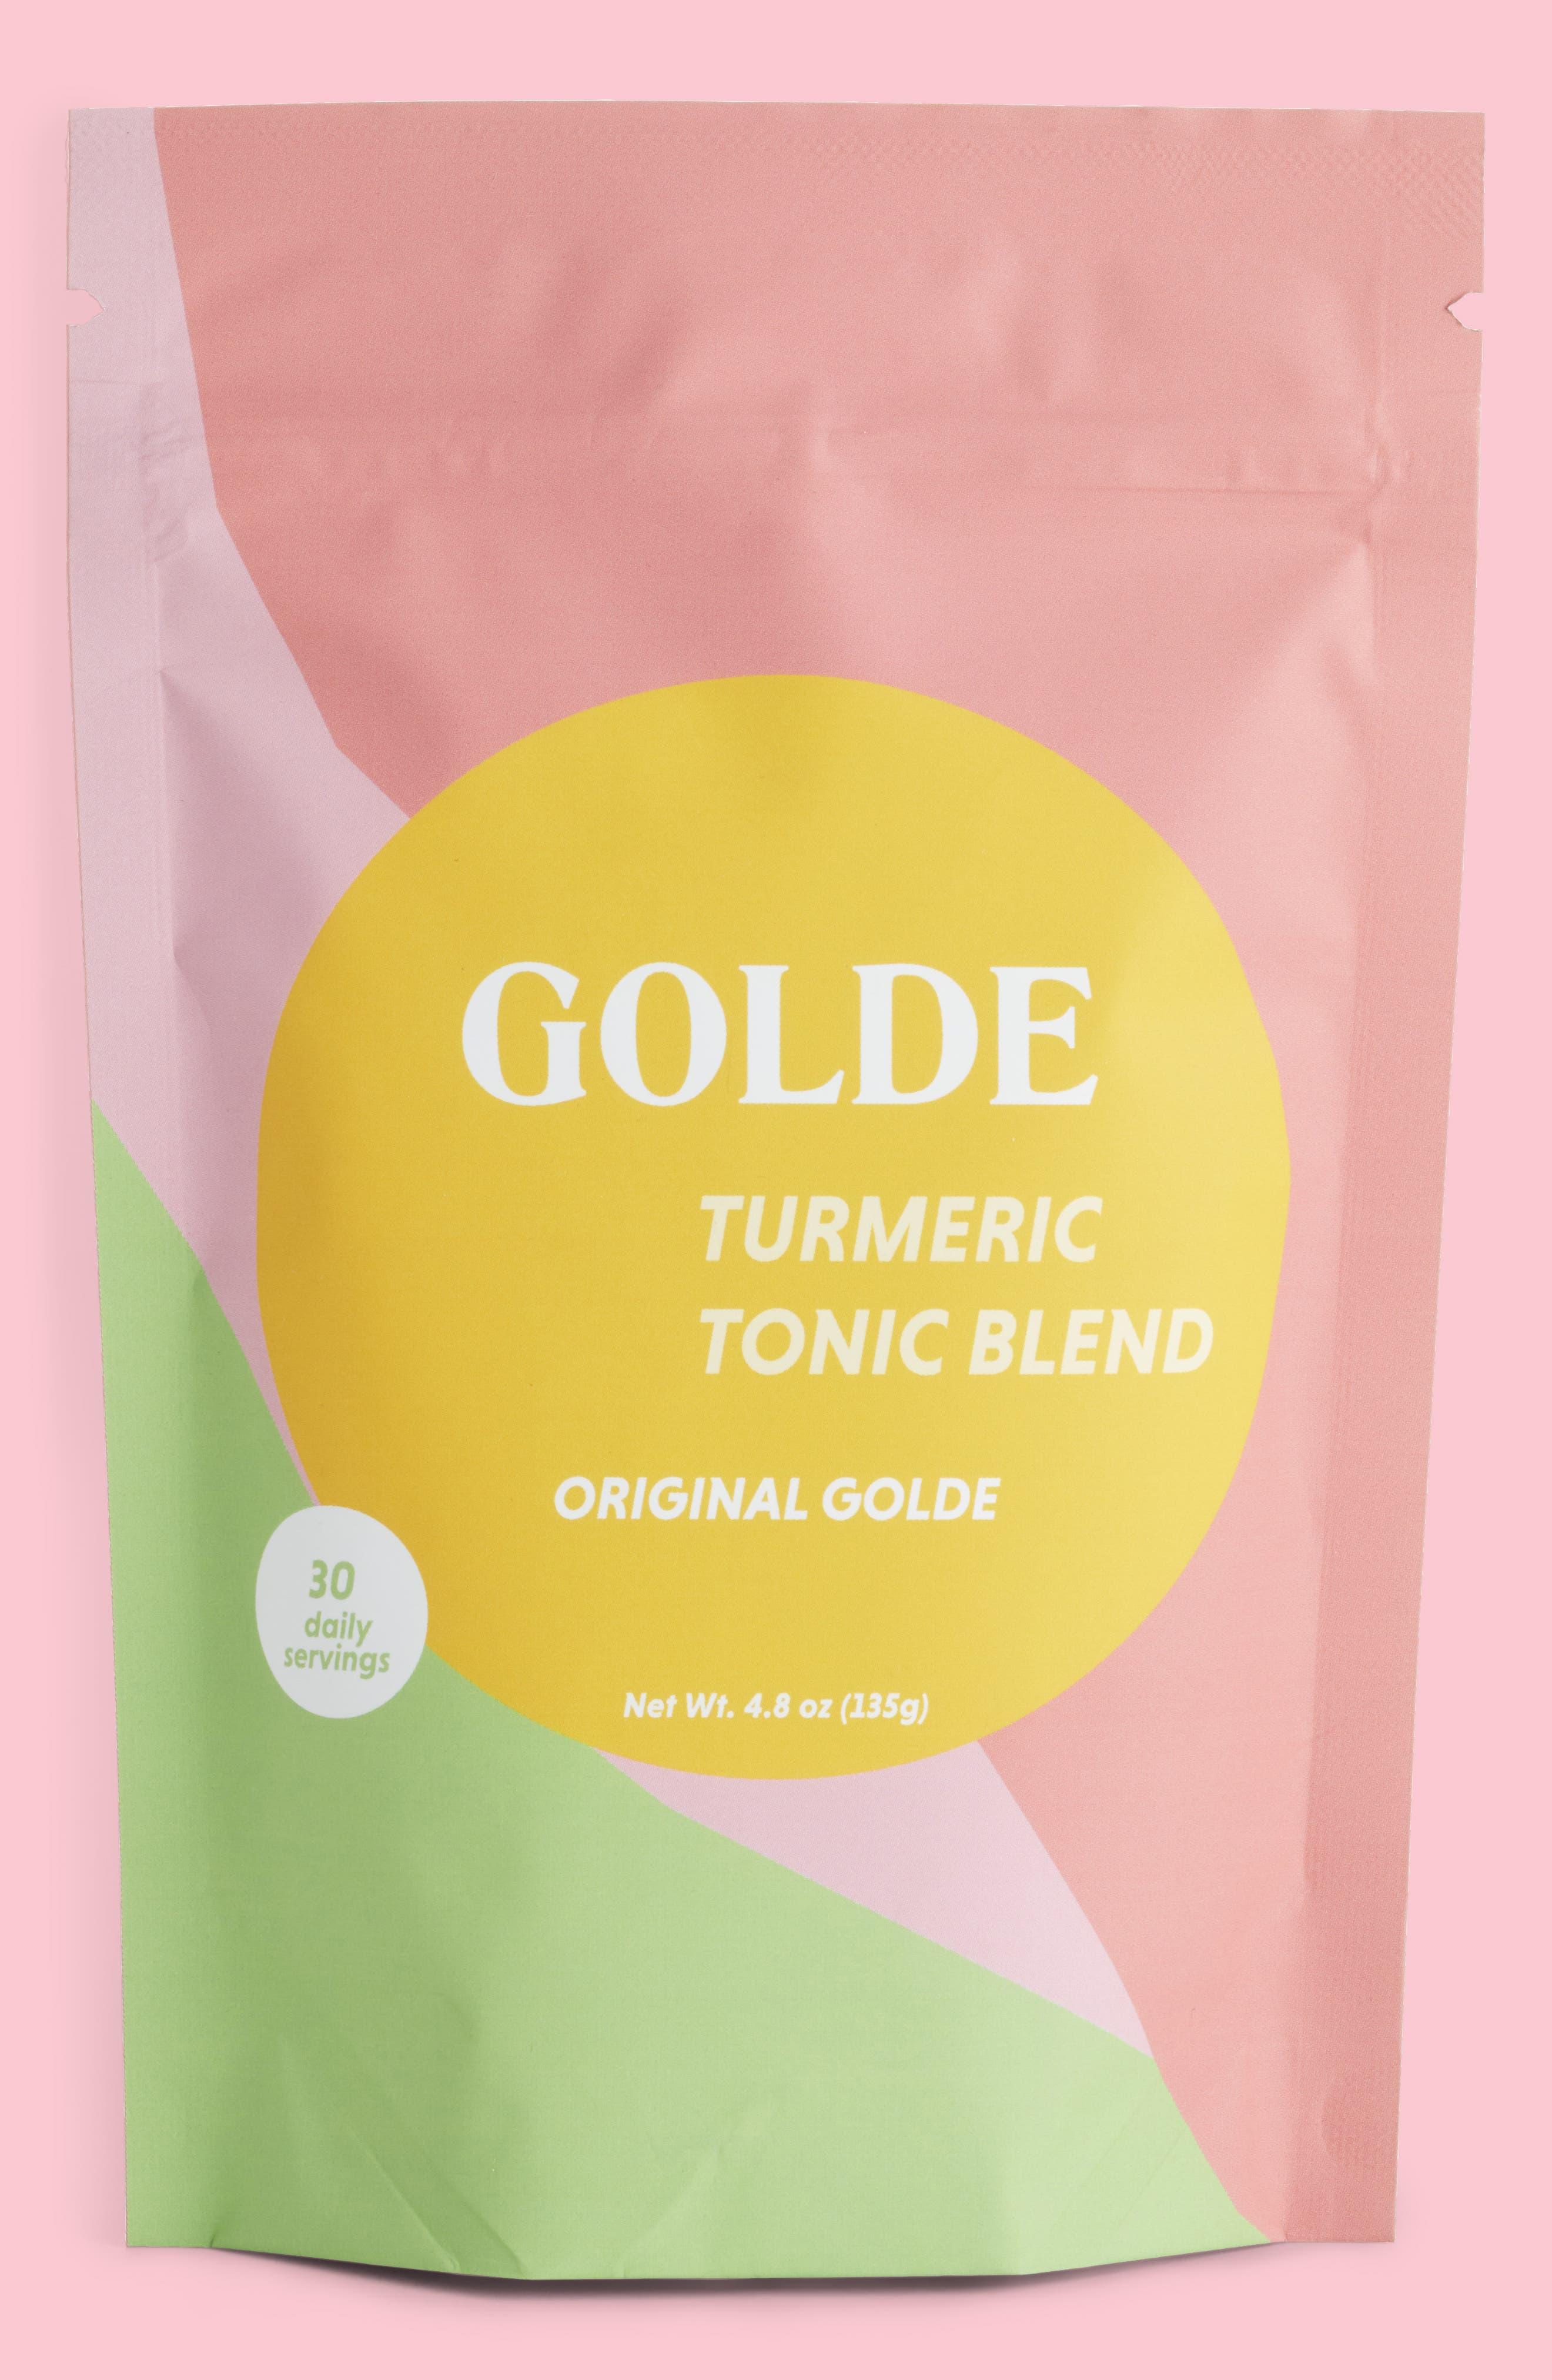 Golde Original Golde Turmeric Tonic Blend,                             Main thumbnail 1, color,                             000